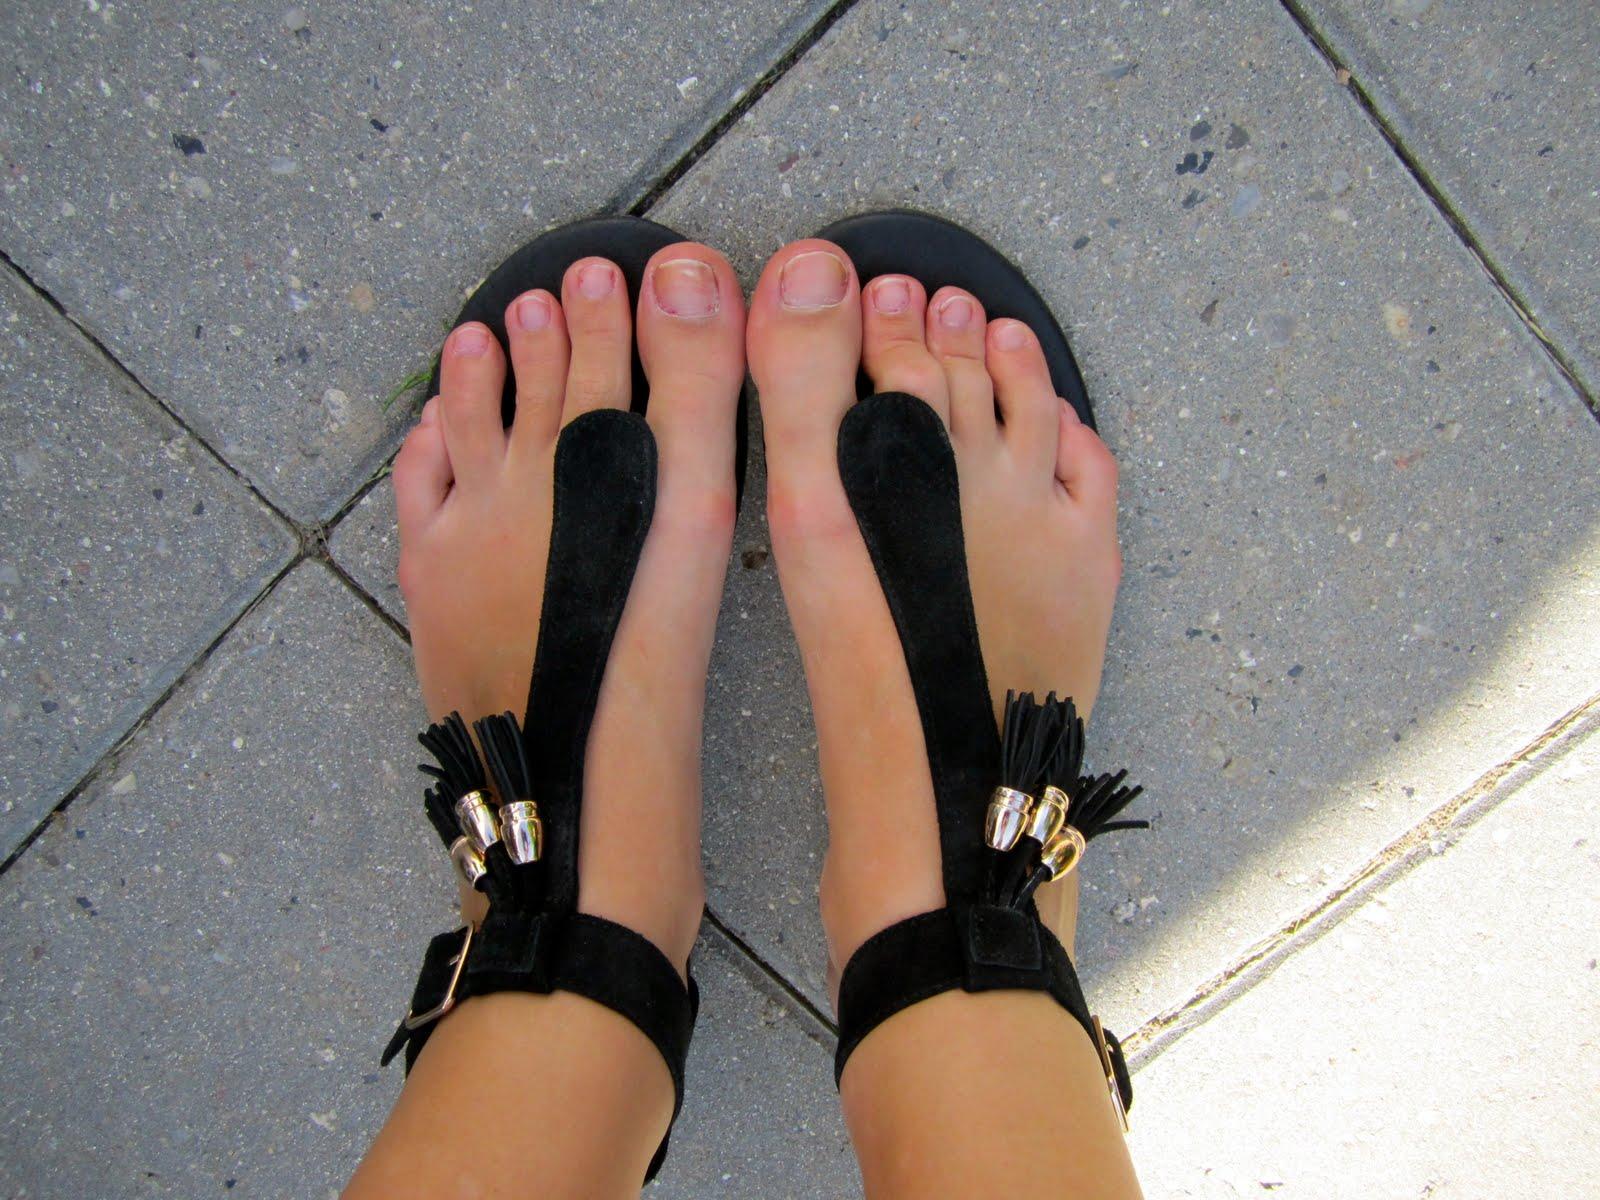 Skoven for bare tæer: Sandalos